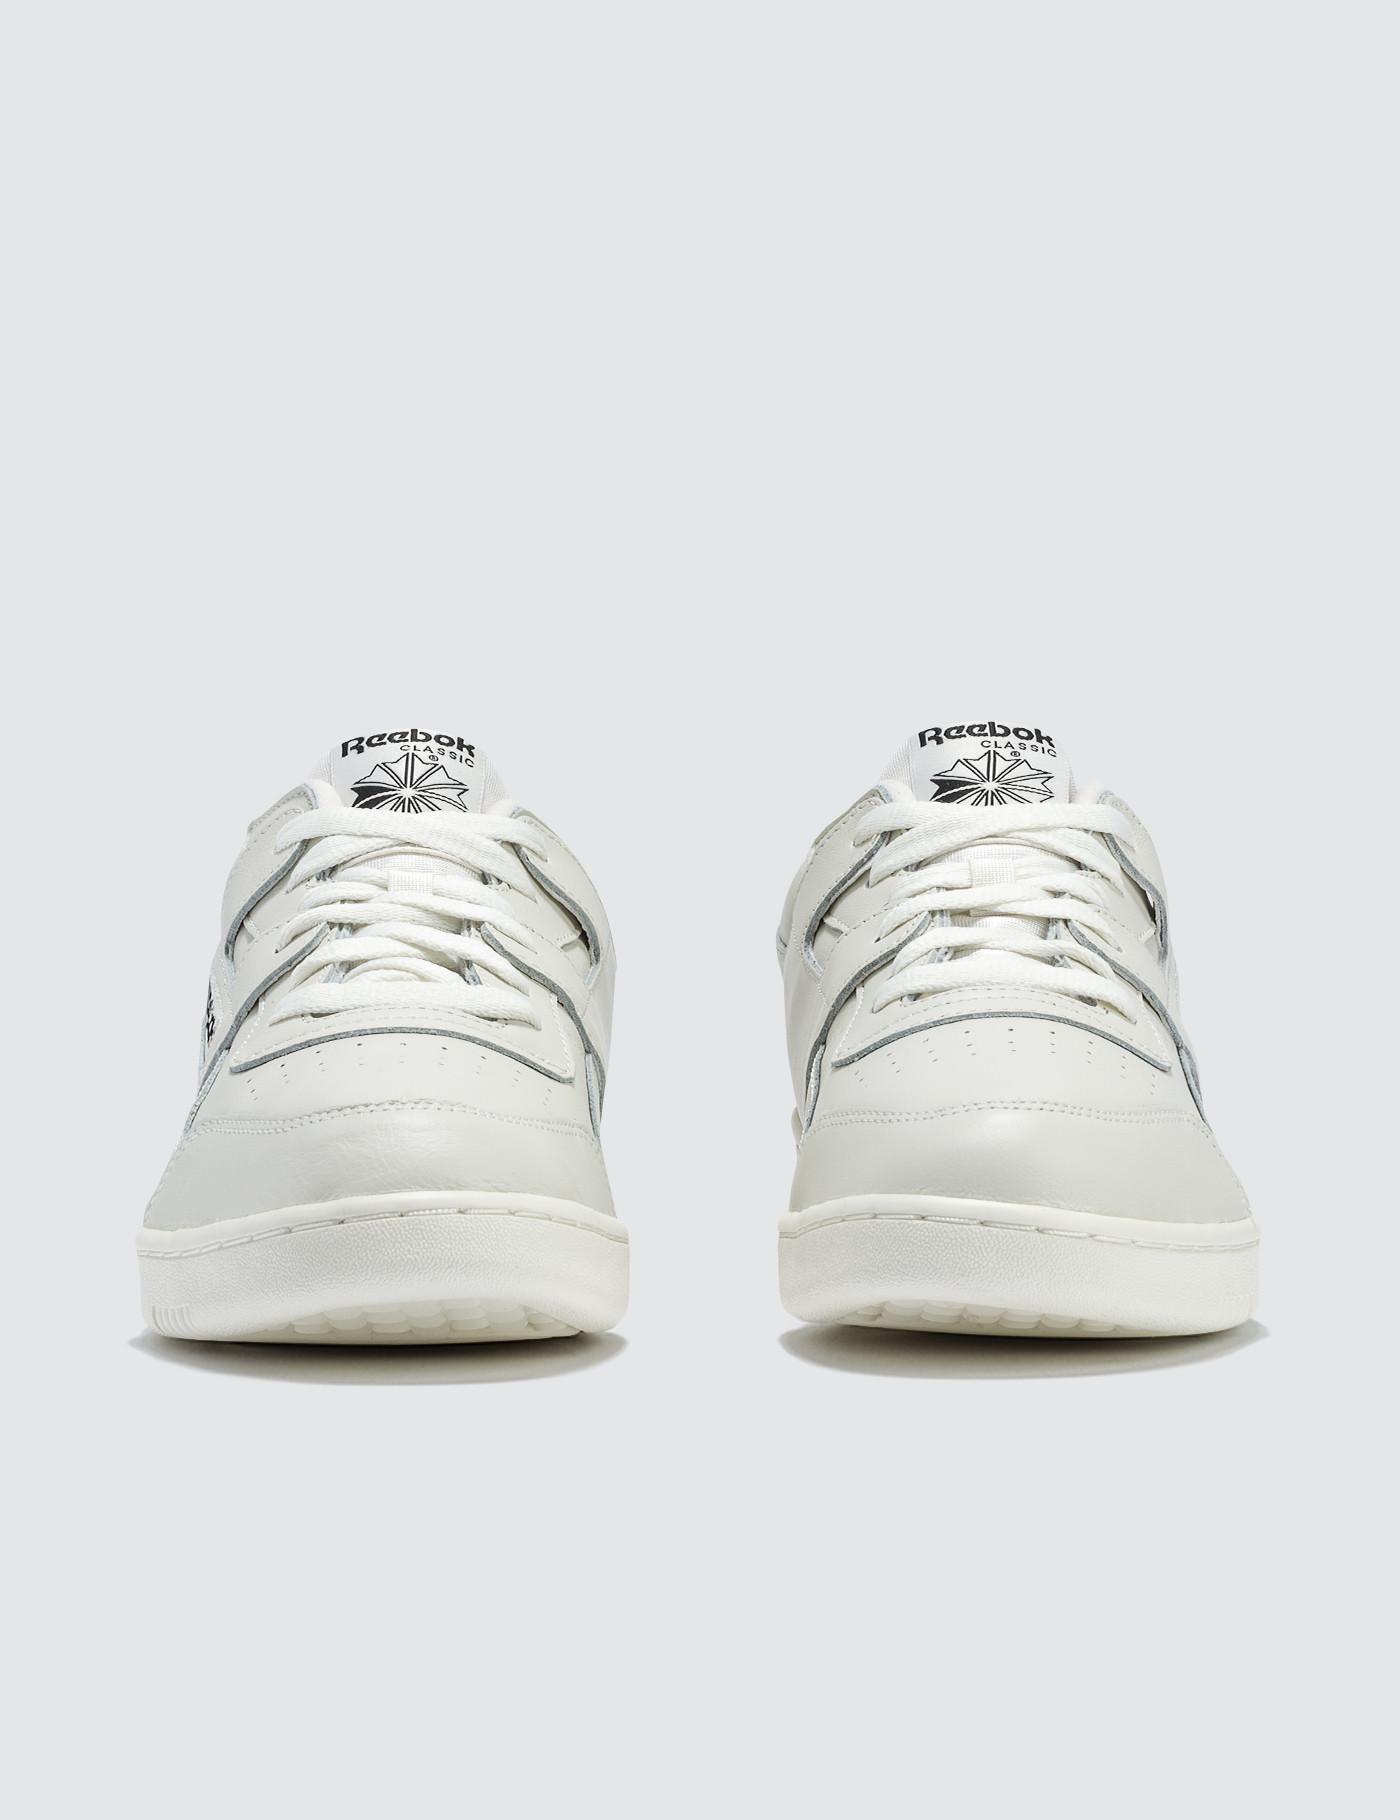 Lyst - Reebok Workout Plus Mu in White for Men ed41a39e3